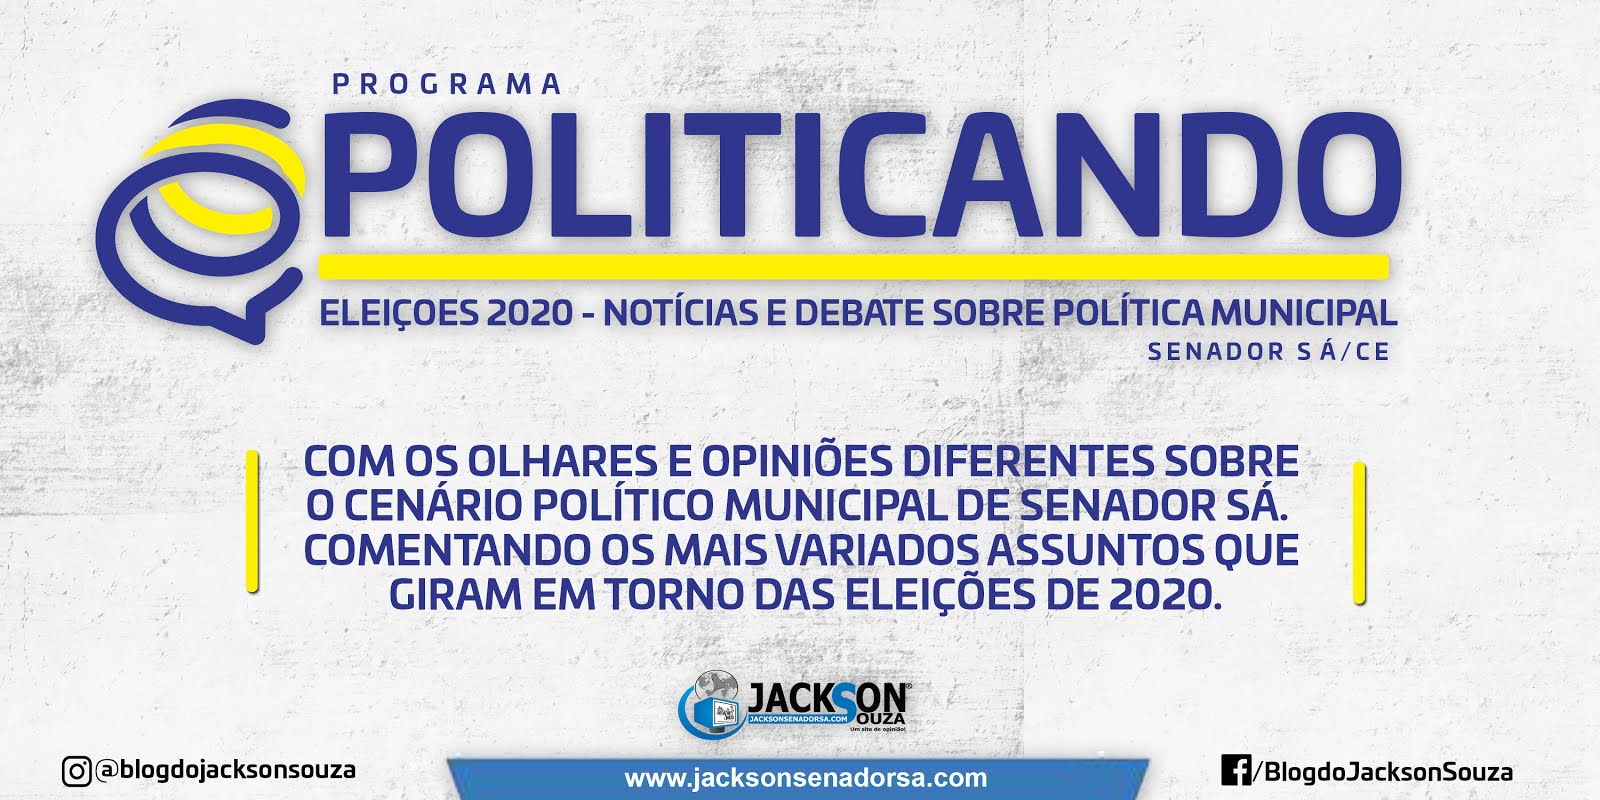 PROGRAMA POLITICANDO